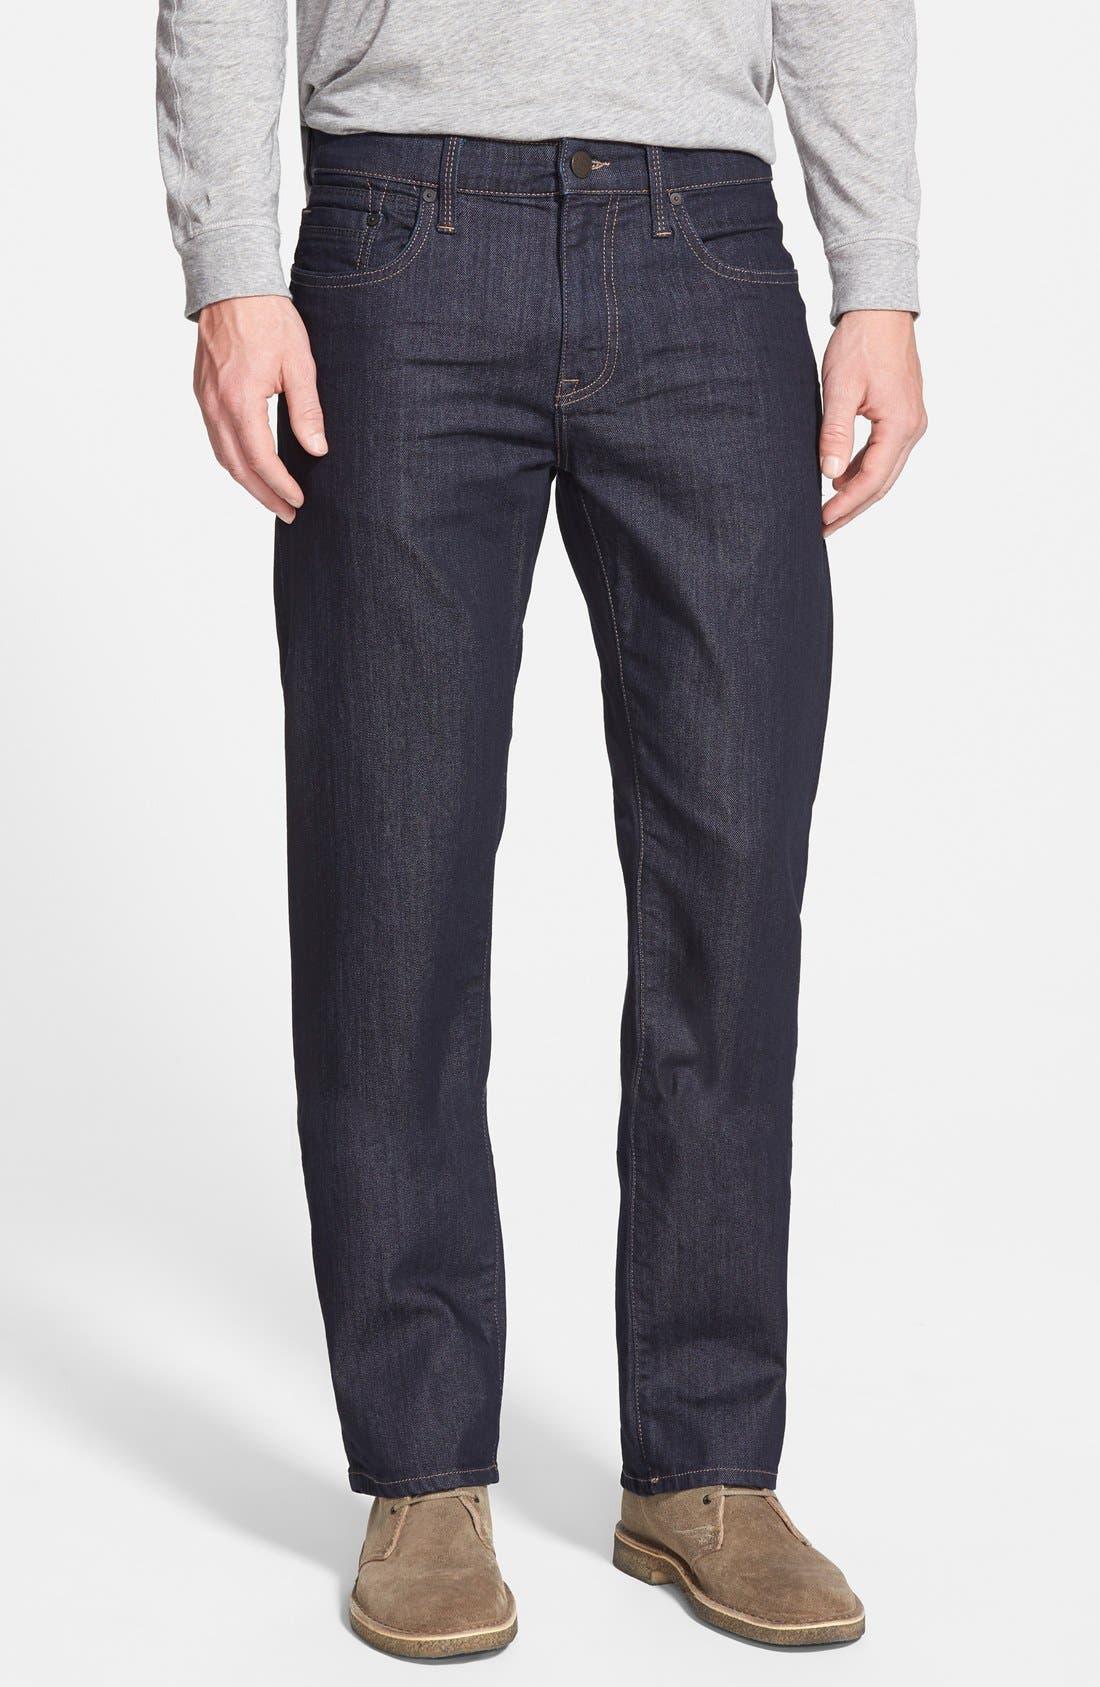 Mavi Jeans Zach Straight Leg Jeans (Rinse Williamsburg) (Regular & Tall)